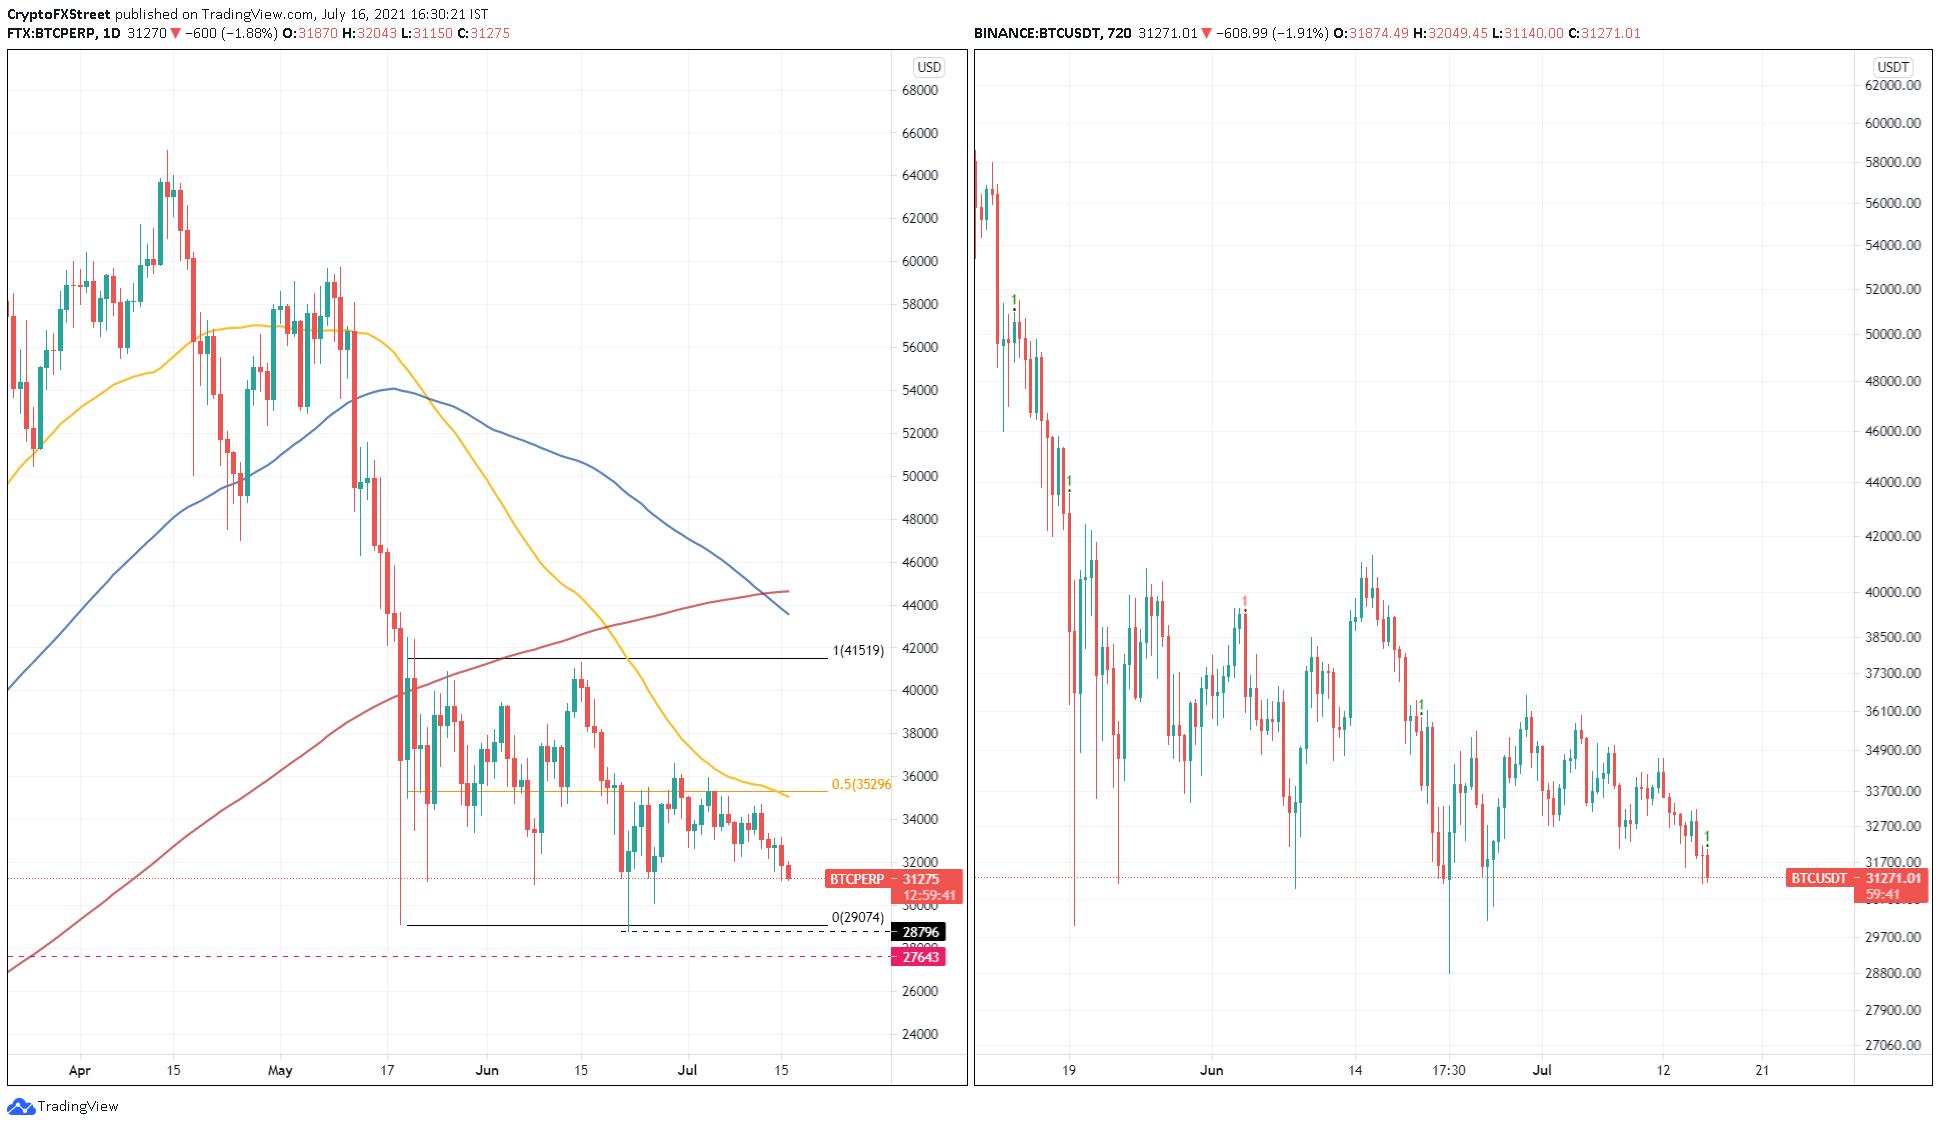 BTC/USDT 1-day, 12-hour chart